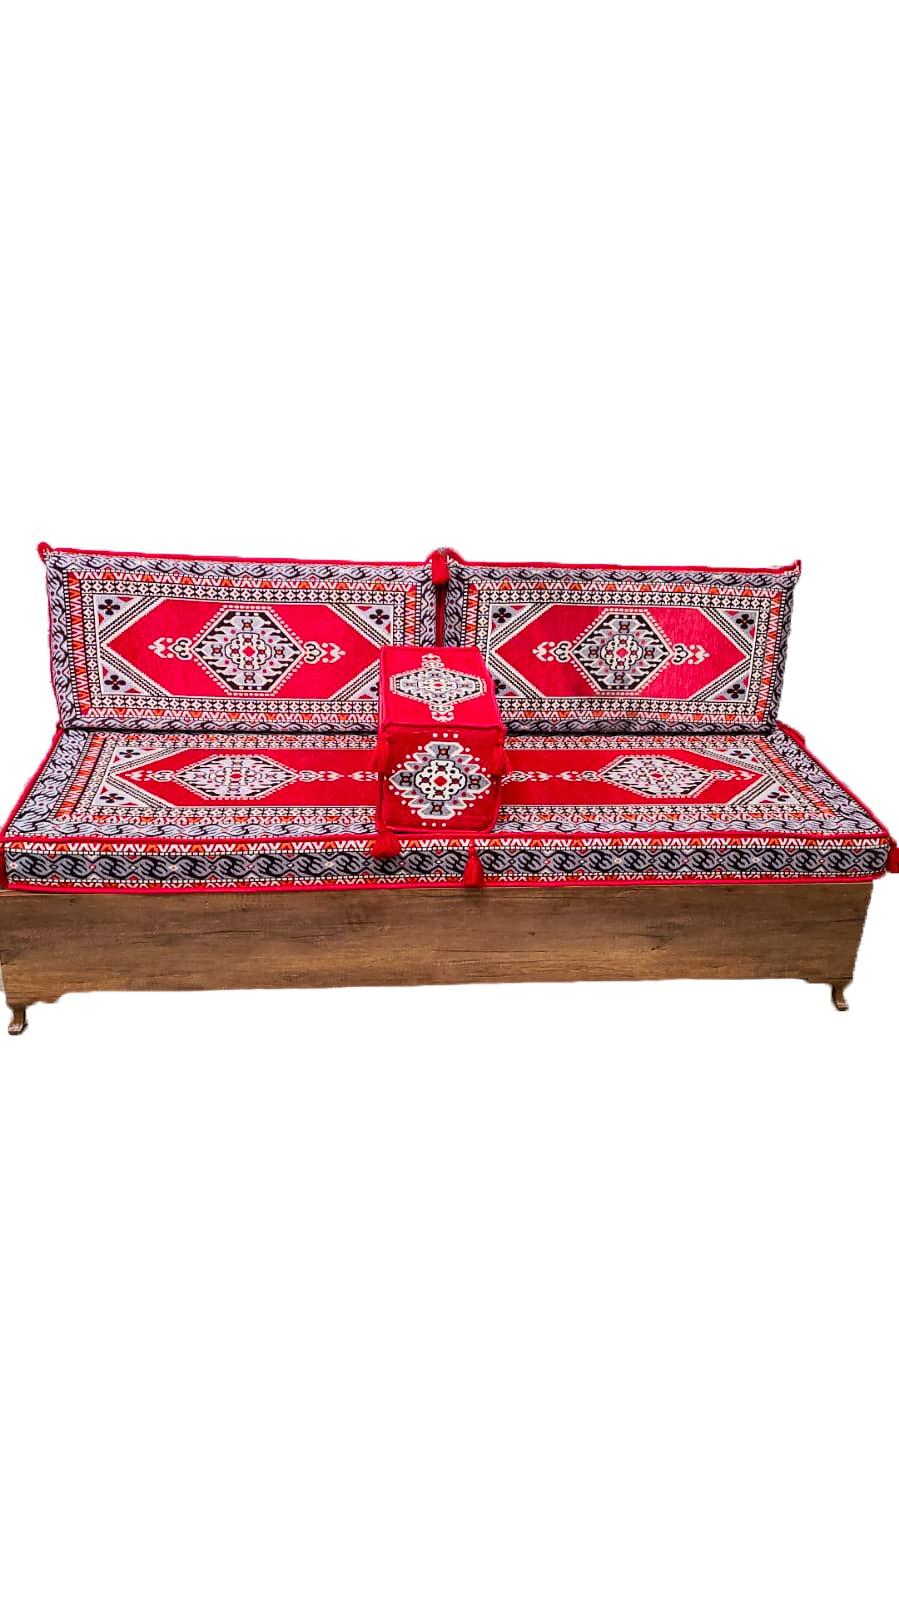 Buy Arabian Floor Lounge Cushion Set